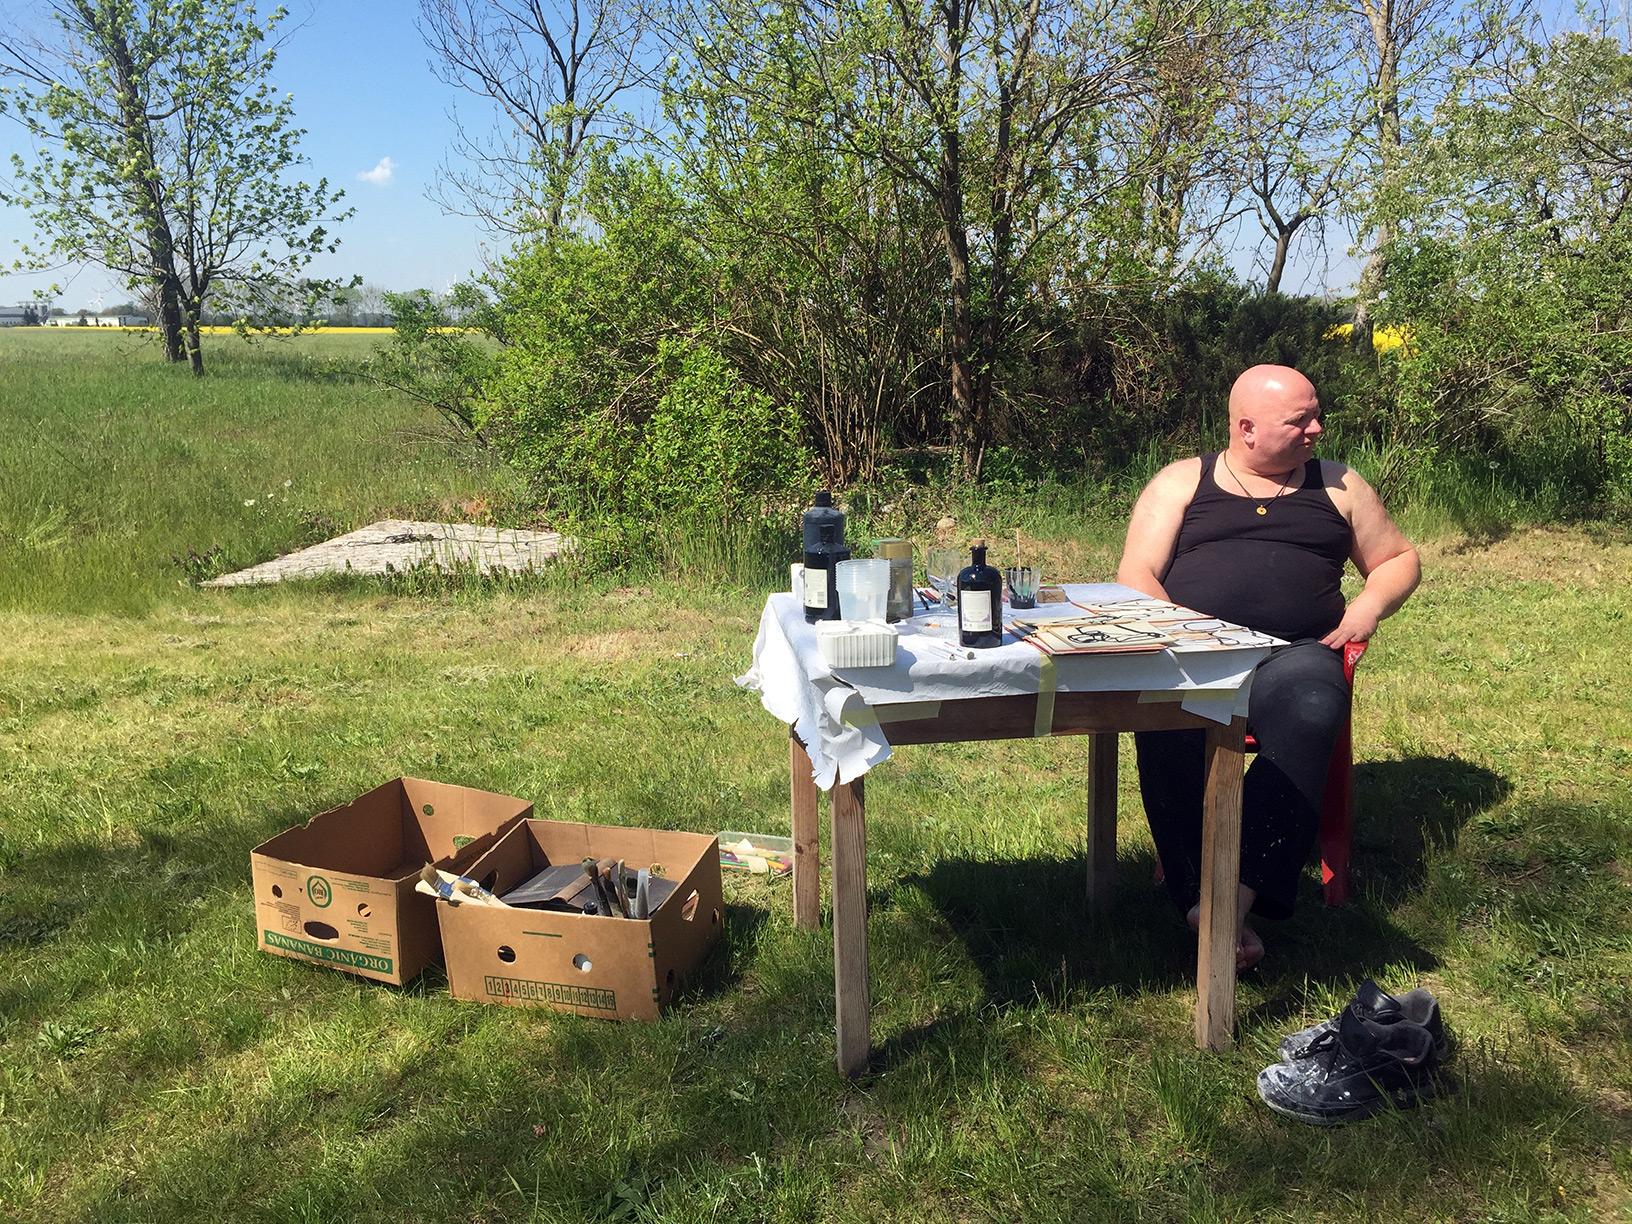 Kunst-Loose-Tage 2016 Julian van Grey Marc de Bourg 7./8. Mai 2016 - Greysland